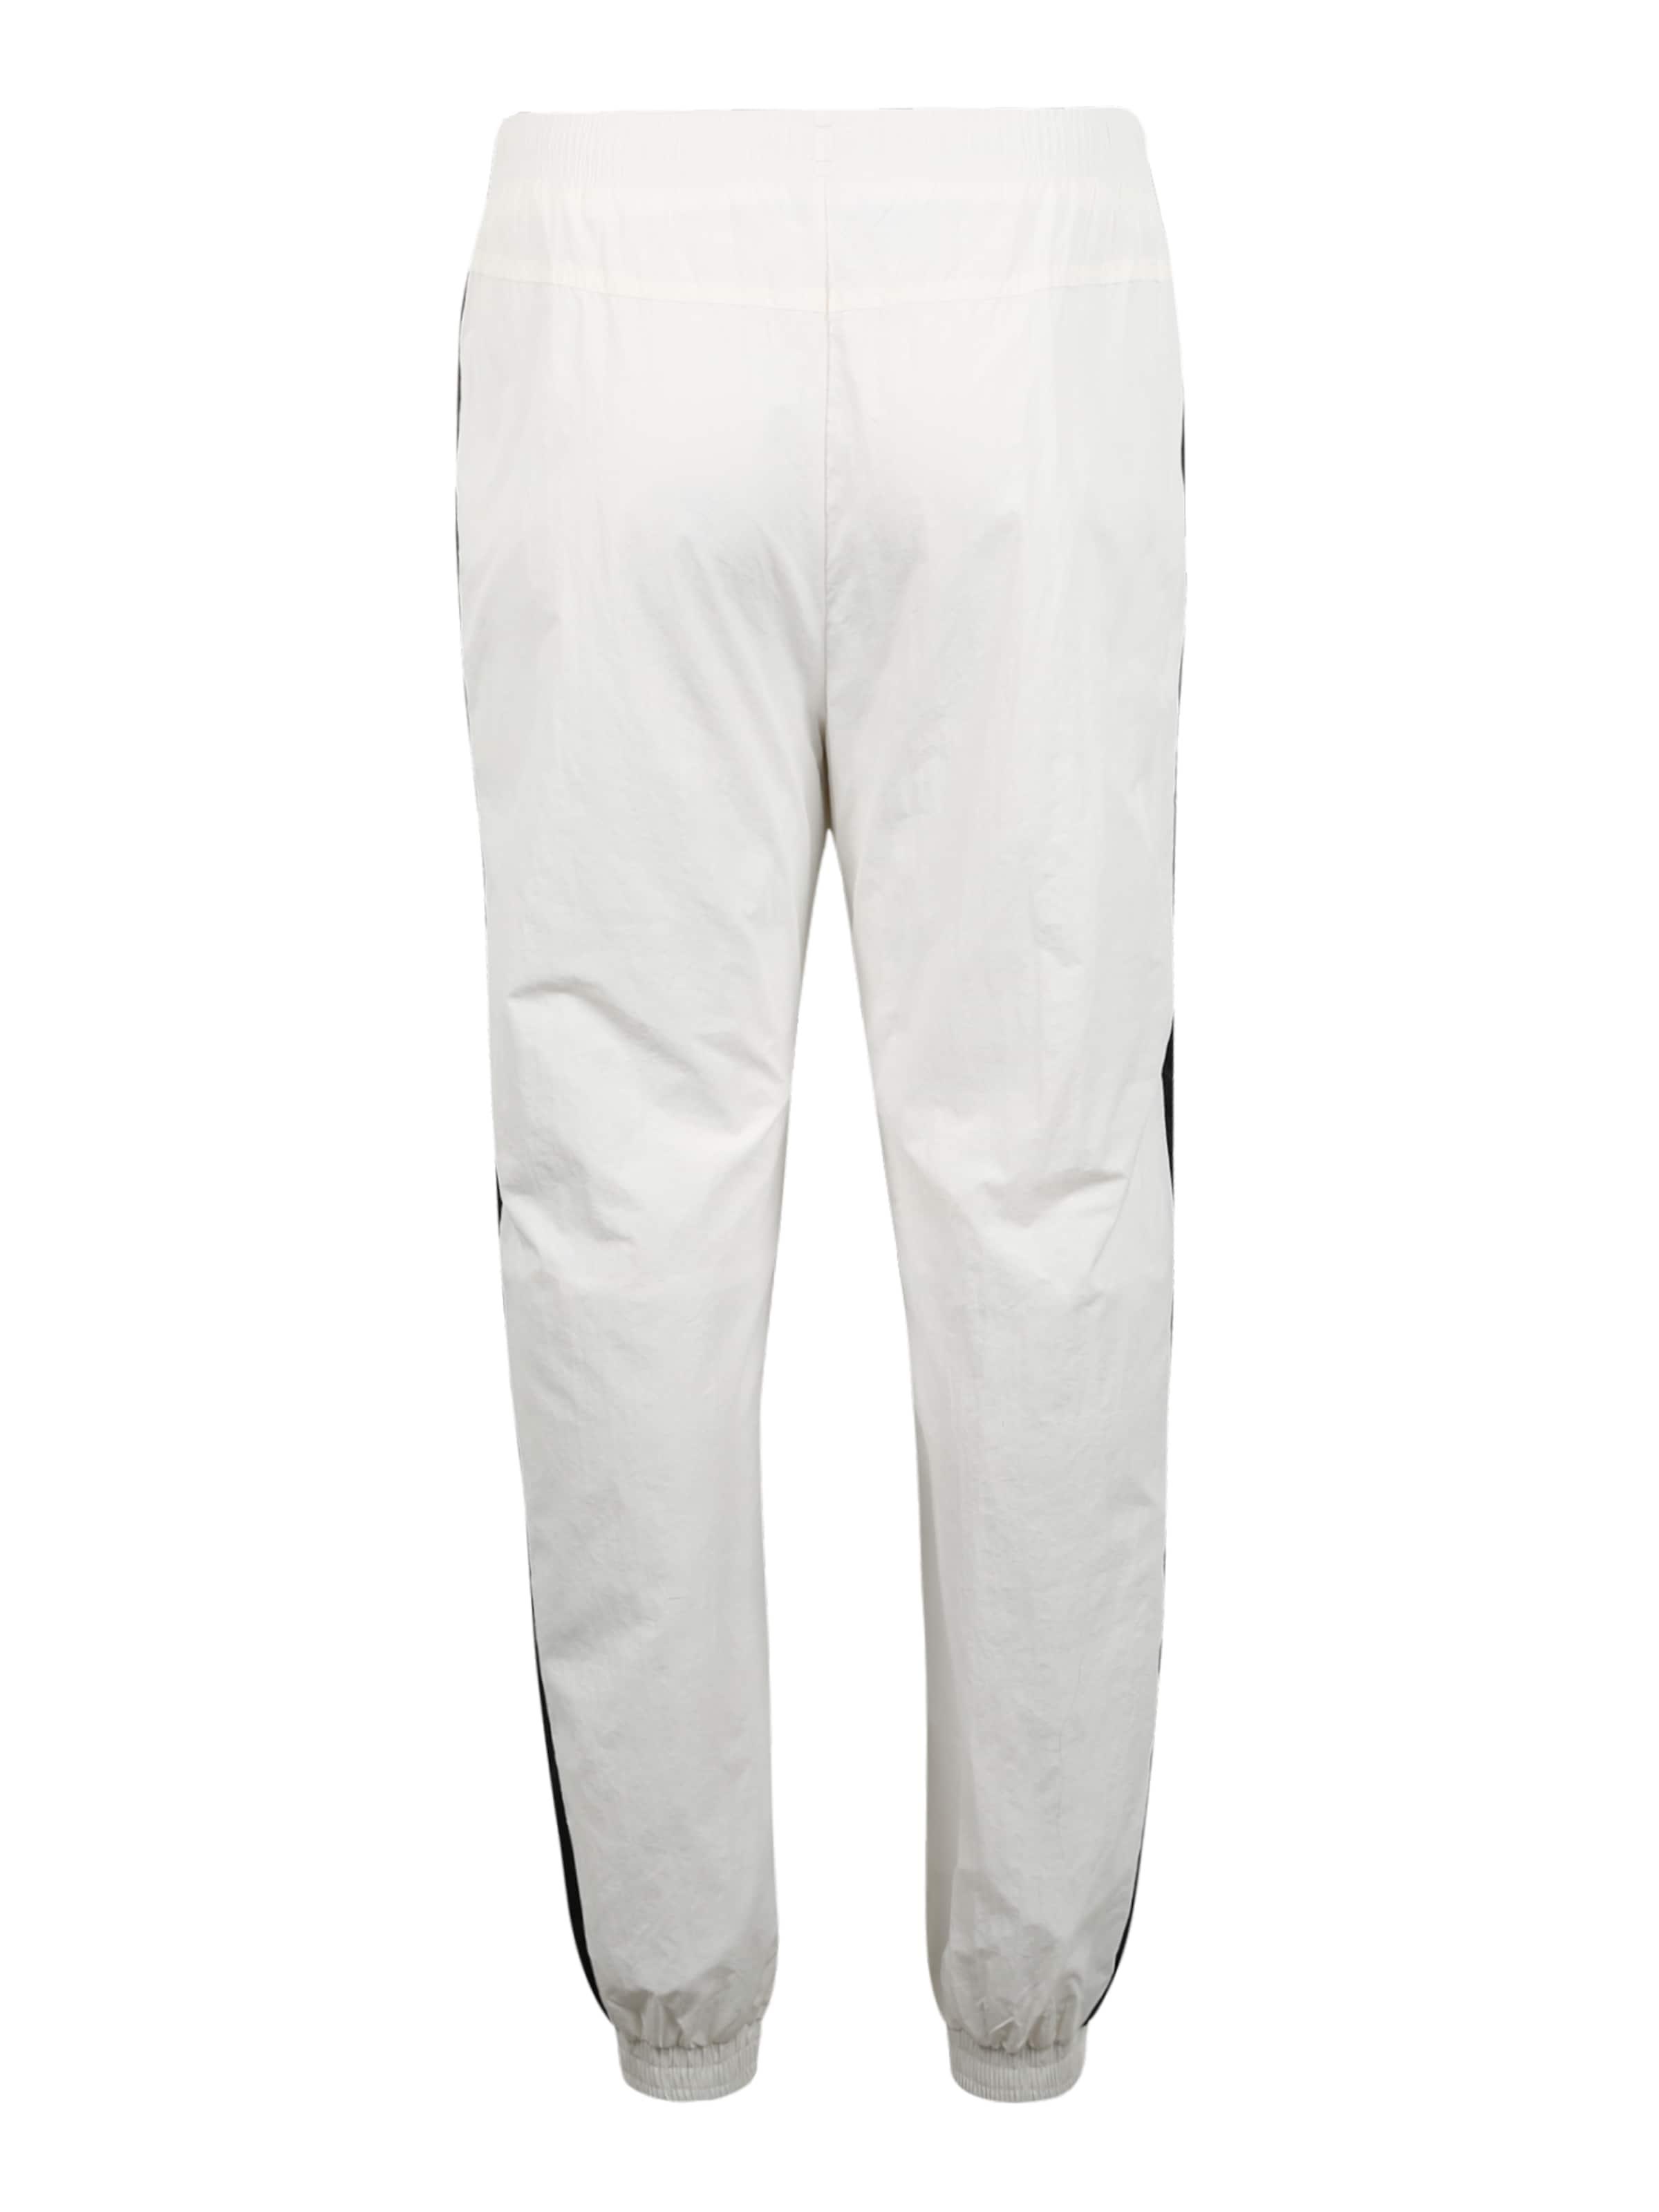 'ladies Striped Pantalon Classics Curvy Crinkle Pants' NoirBlanc Urban En OZkuPXi